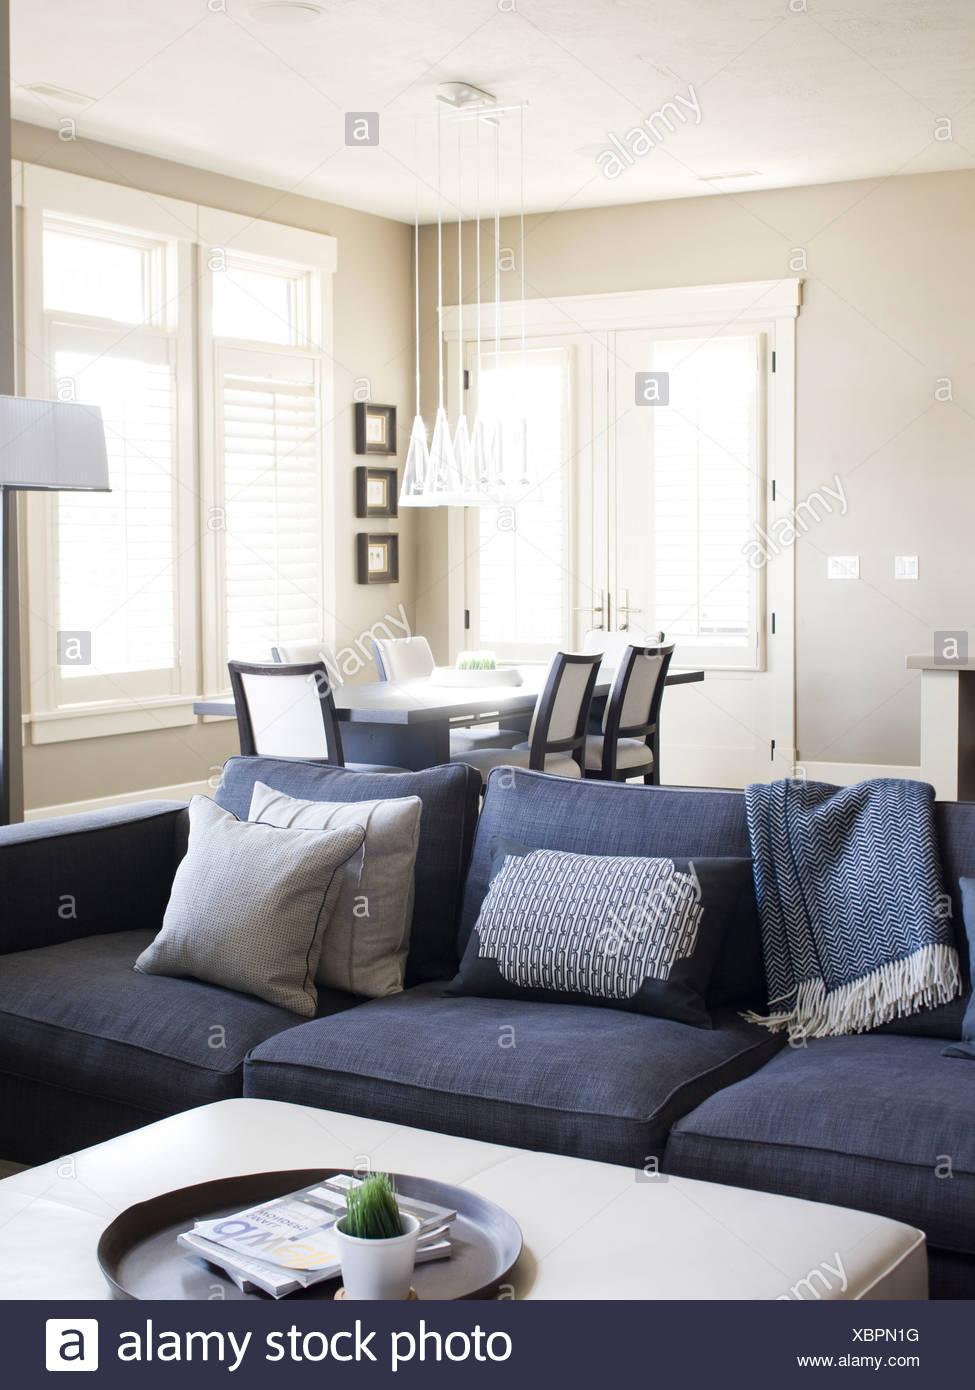 USA, Utah, Provo, Sofa in luxury home - Stock Image